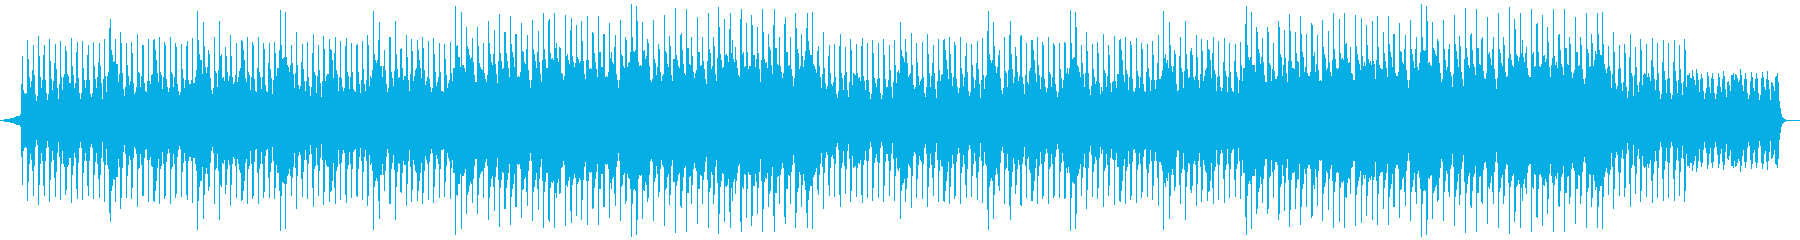 A futuristic and transparent OP! Piano pops's reproduced waveform